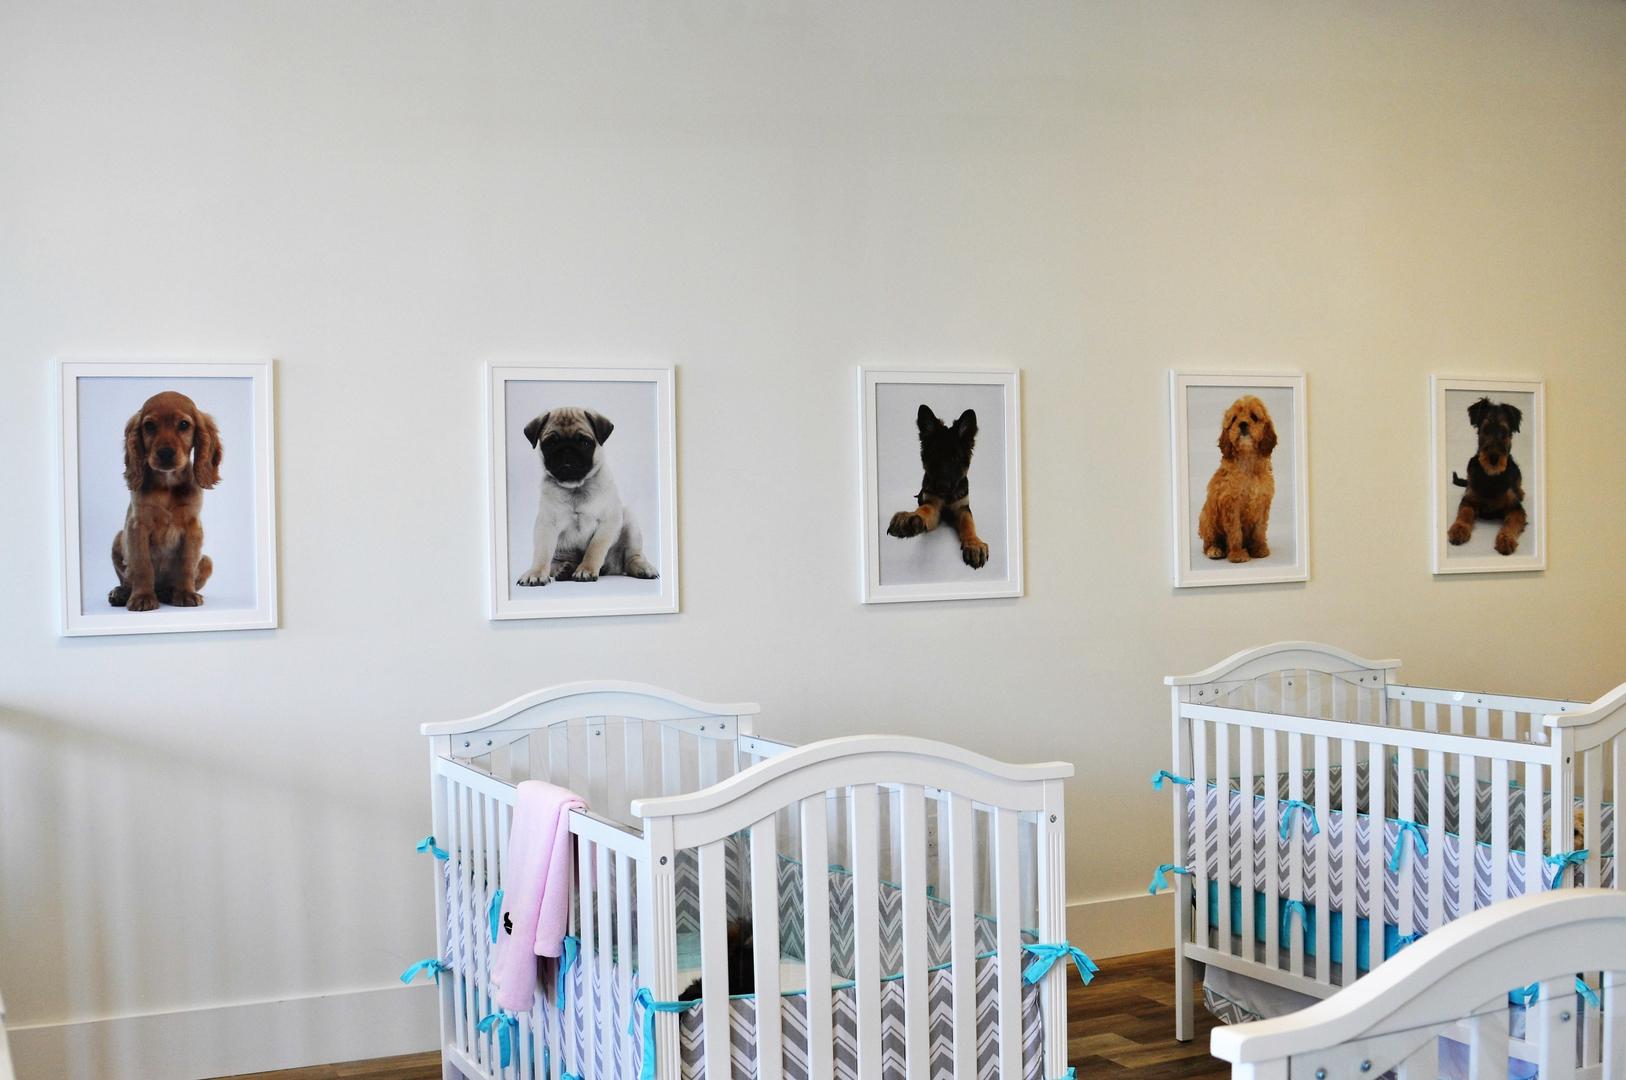 Baby cribs nashville tn - French Bulldog Puppies For Sale Nashville Pug Puppies For Sale Nashville Goldendoodle Puppies For Sale Nashville Akc Puppies For Sale Nashville